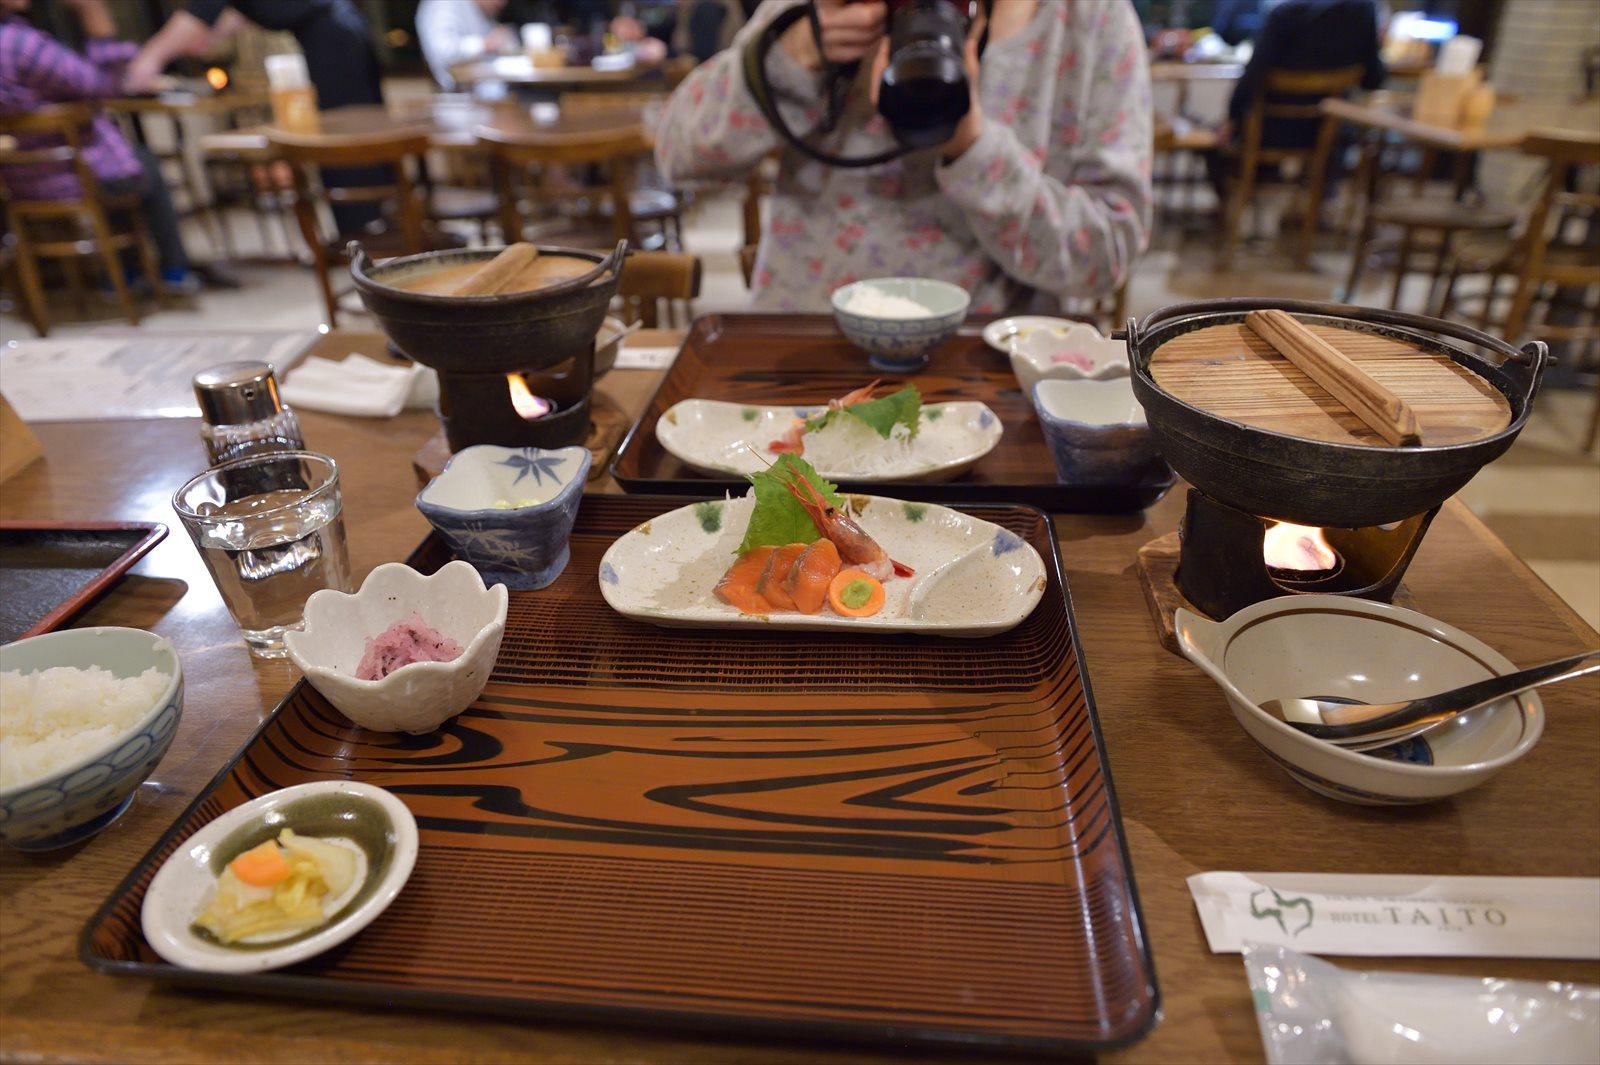 【鶴居村】HOTEL TAITO_a0145819_2164048.jpg